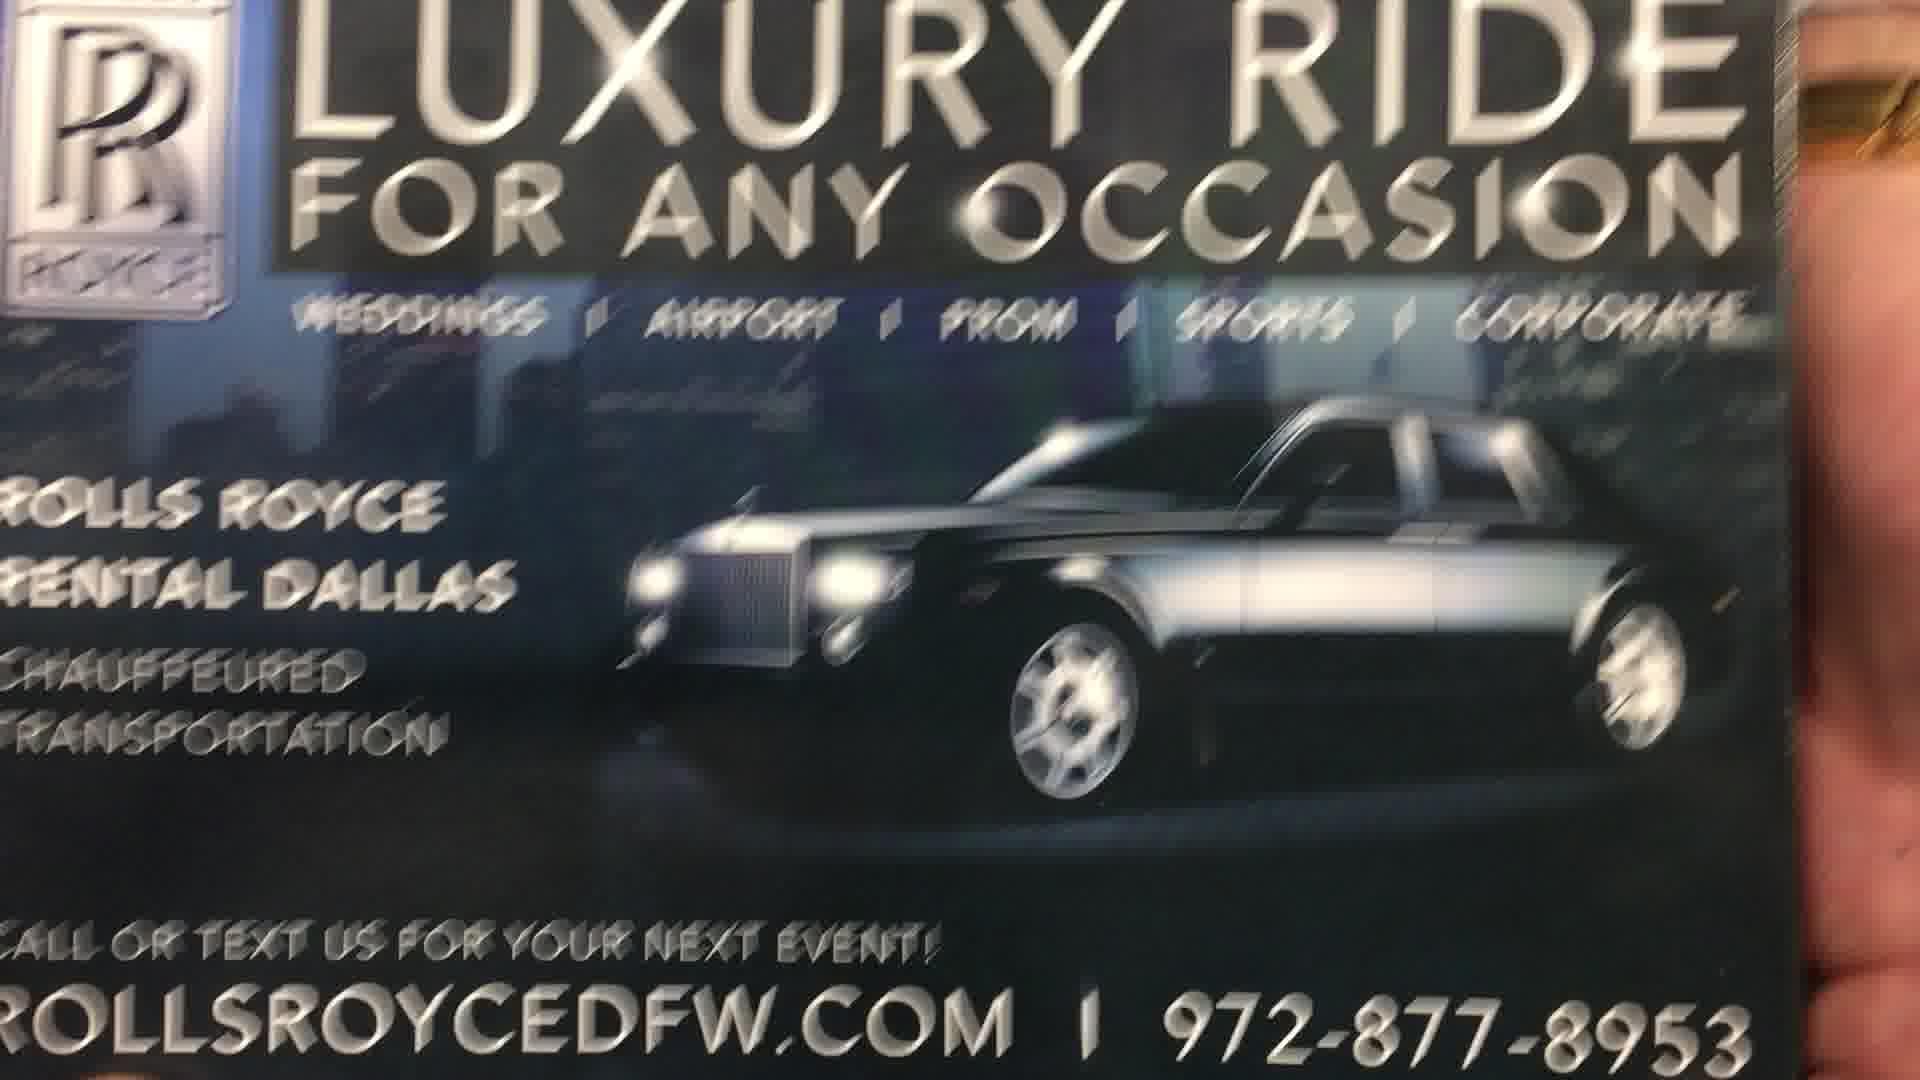 Rolls Royce limousine service Rockwall Texas